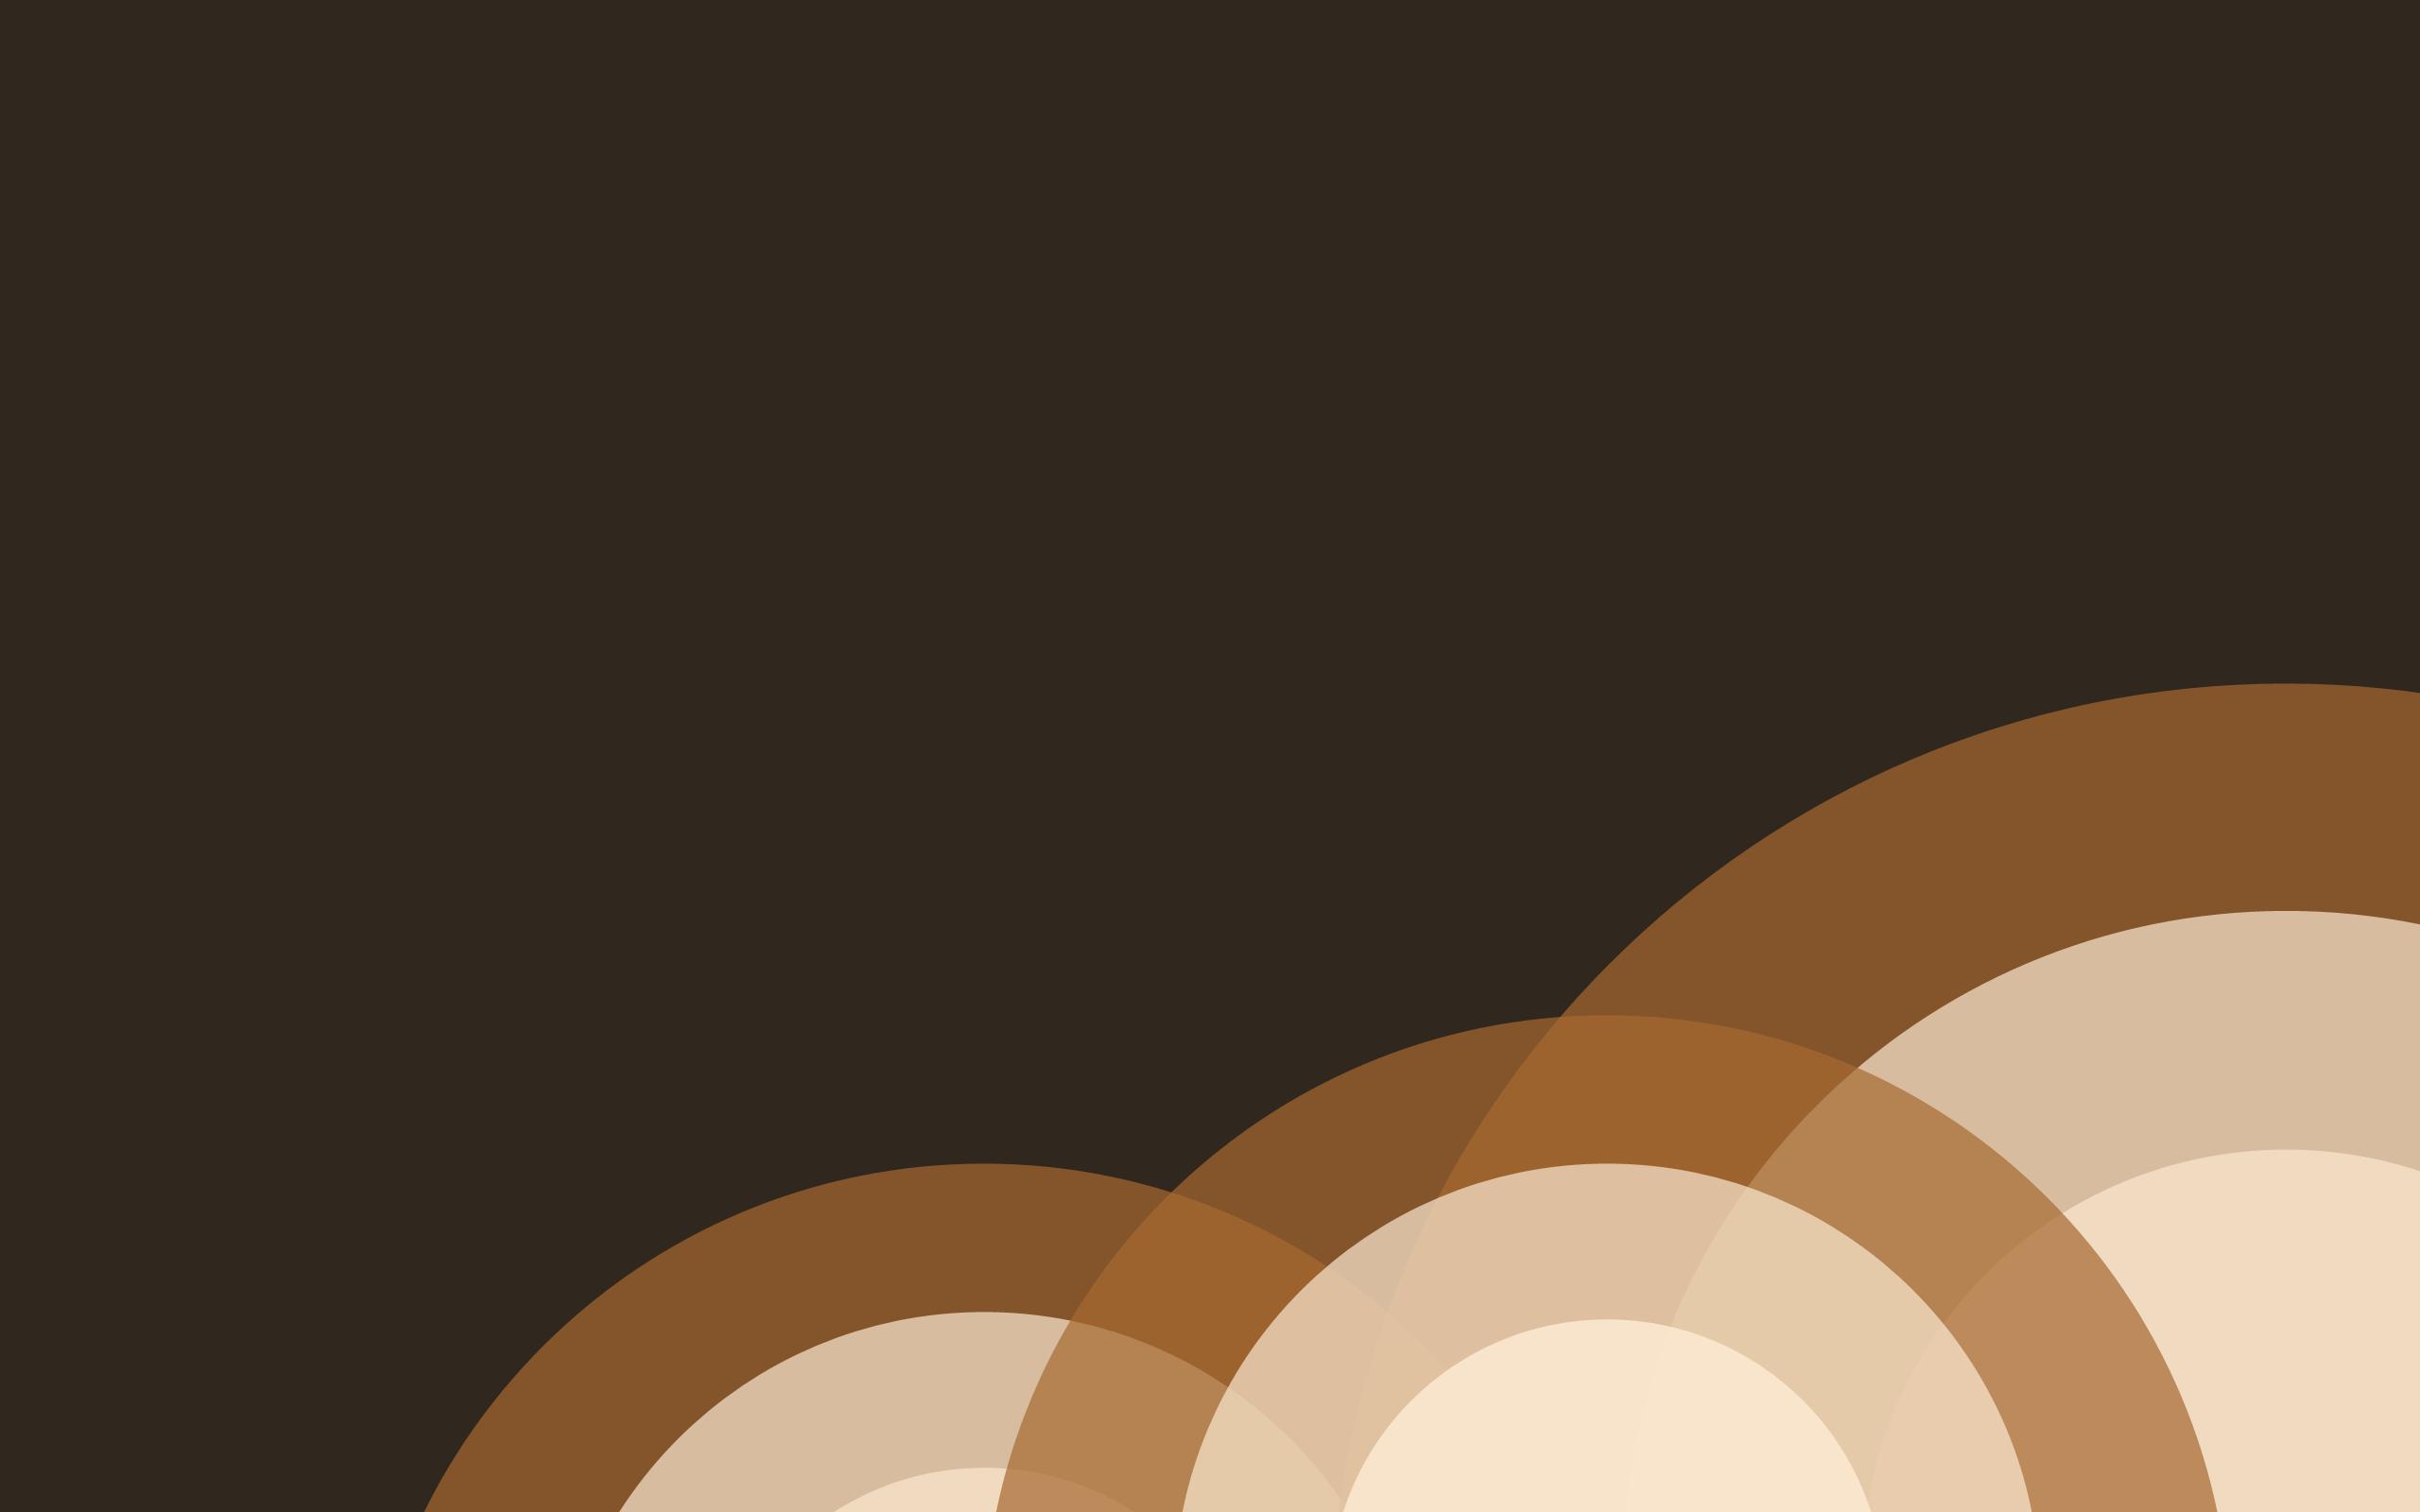 Minimal Brown Wallpaper 45738 2560x1600 Px